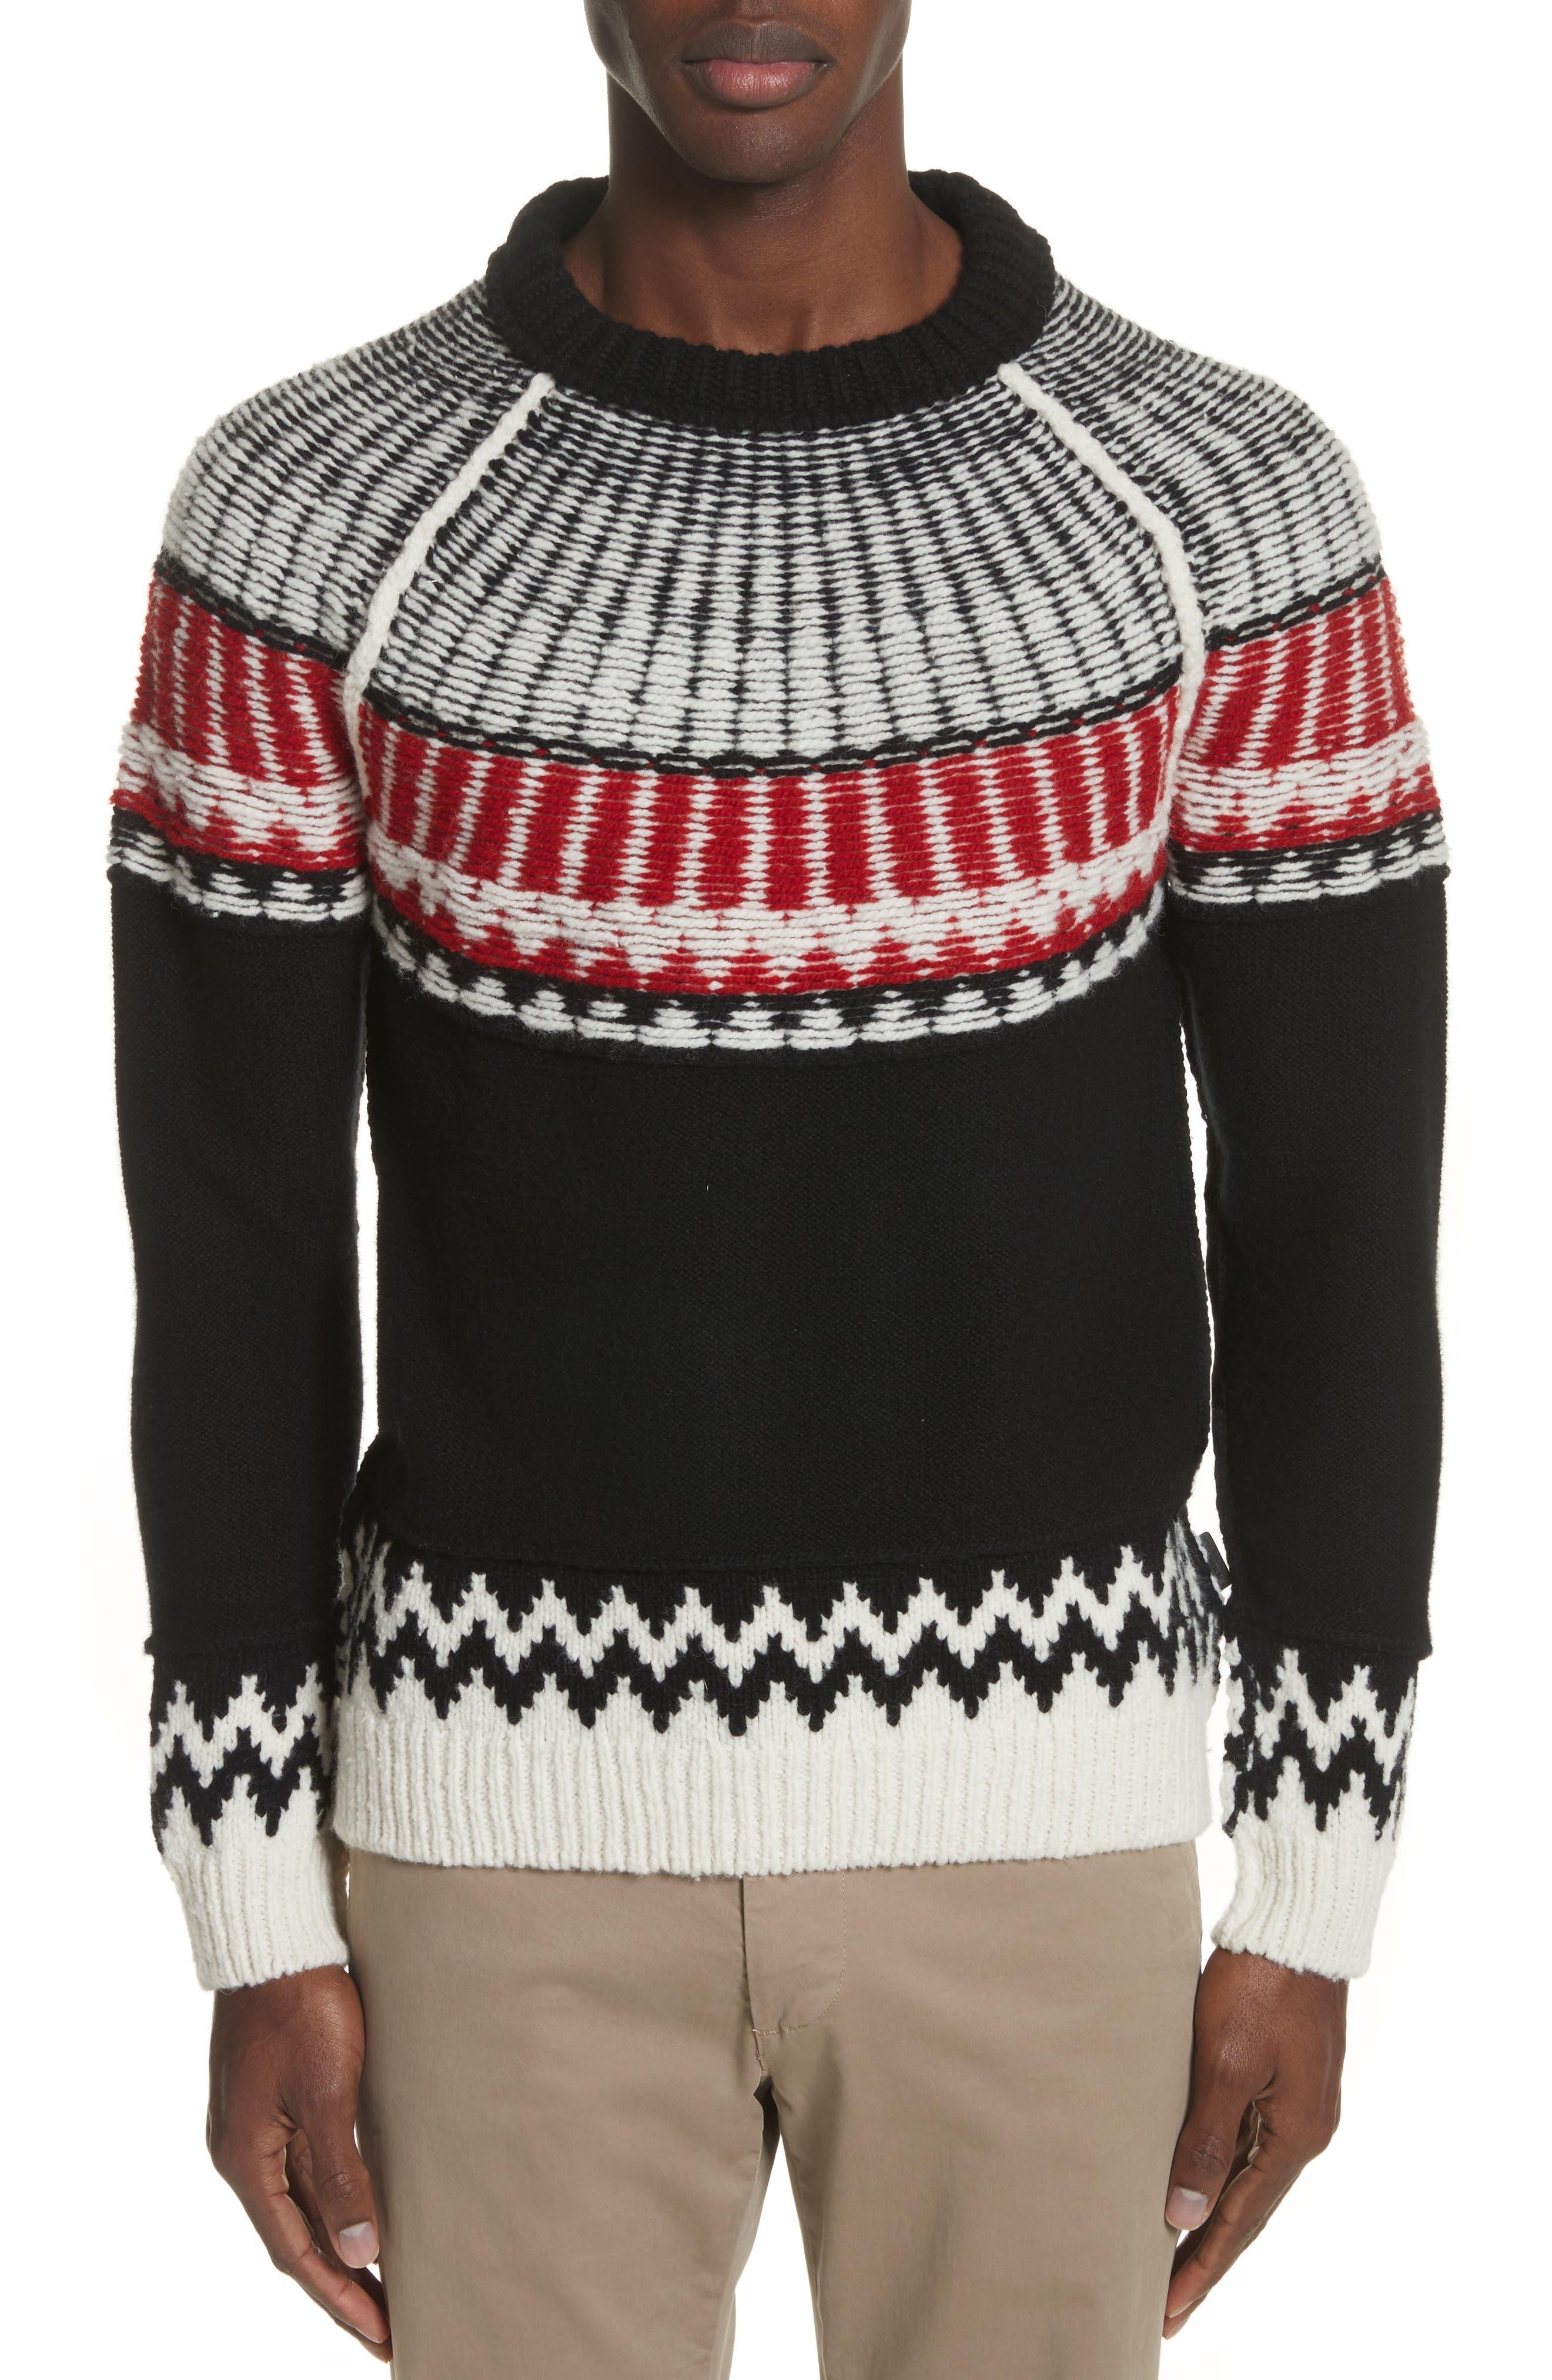 Rycroft Wool & Cashmere Blend Sweater,                             Main thumbnail 1, color,                             001